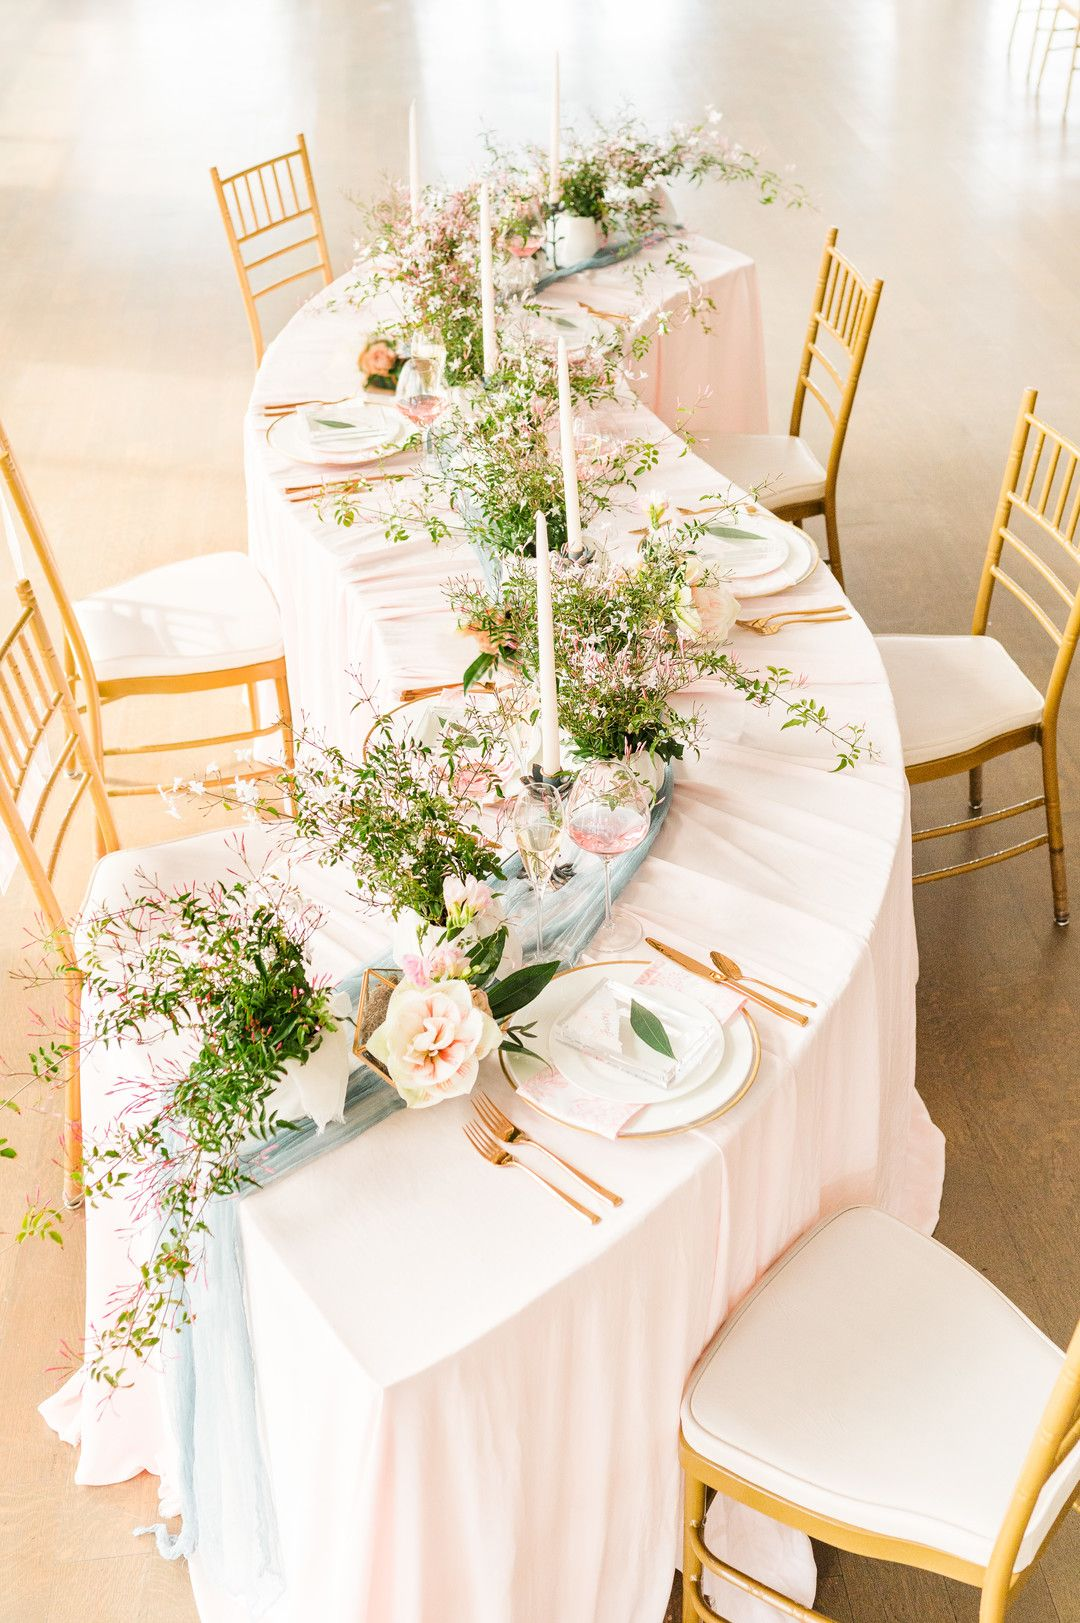 Wedding Reception At Willowdale Estate Boston Massachusetts Sweetheart Table Flowers Wedding Candles Table Sweetheart Table Wedding